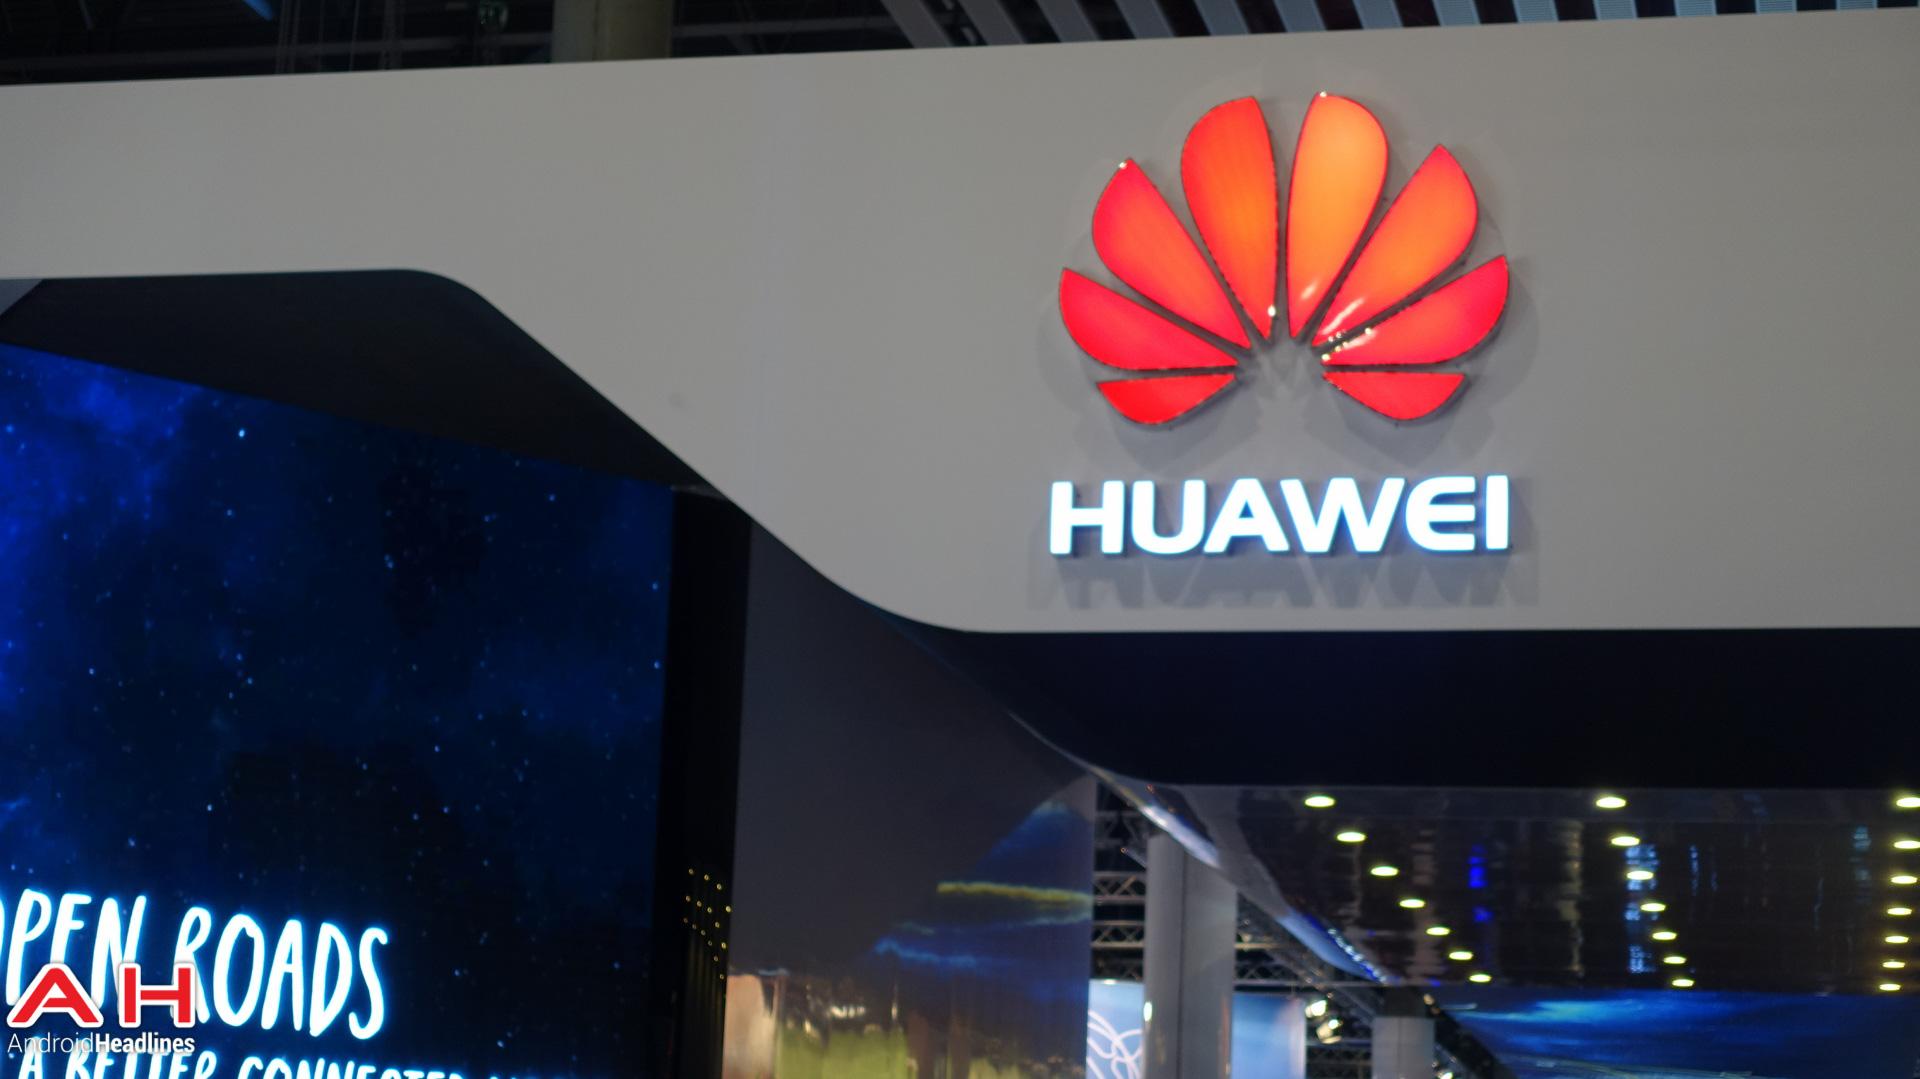 مشخصات گوشی Huawei Honor 7 Plus لو رفت